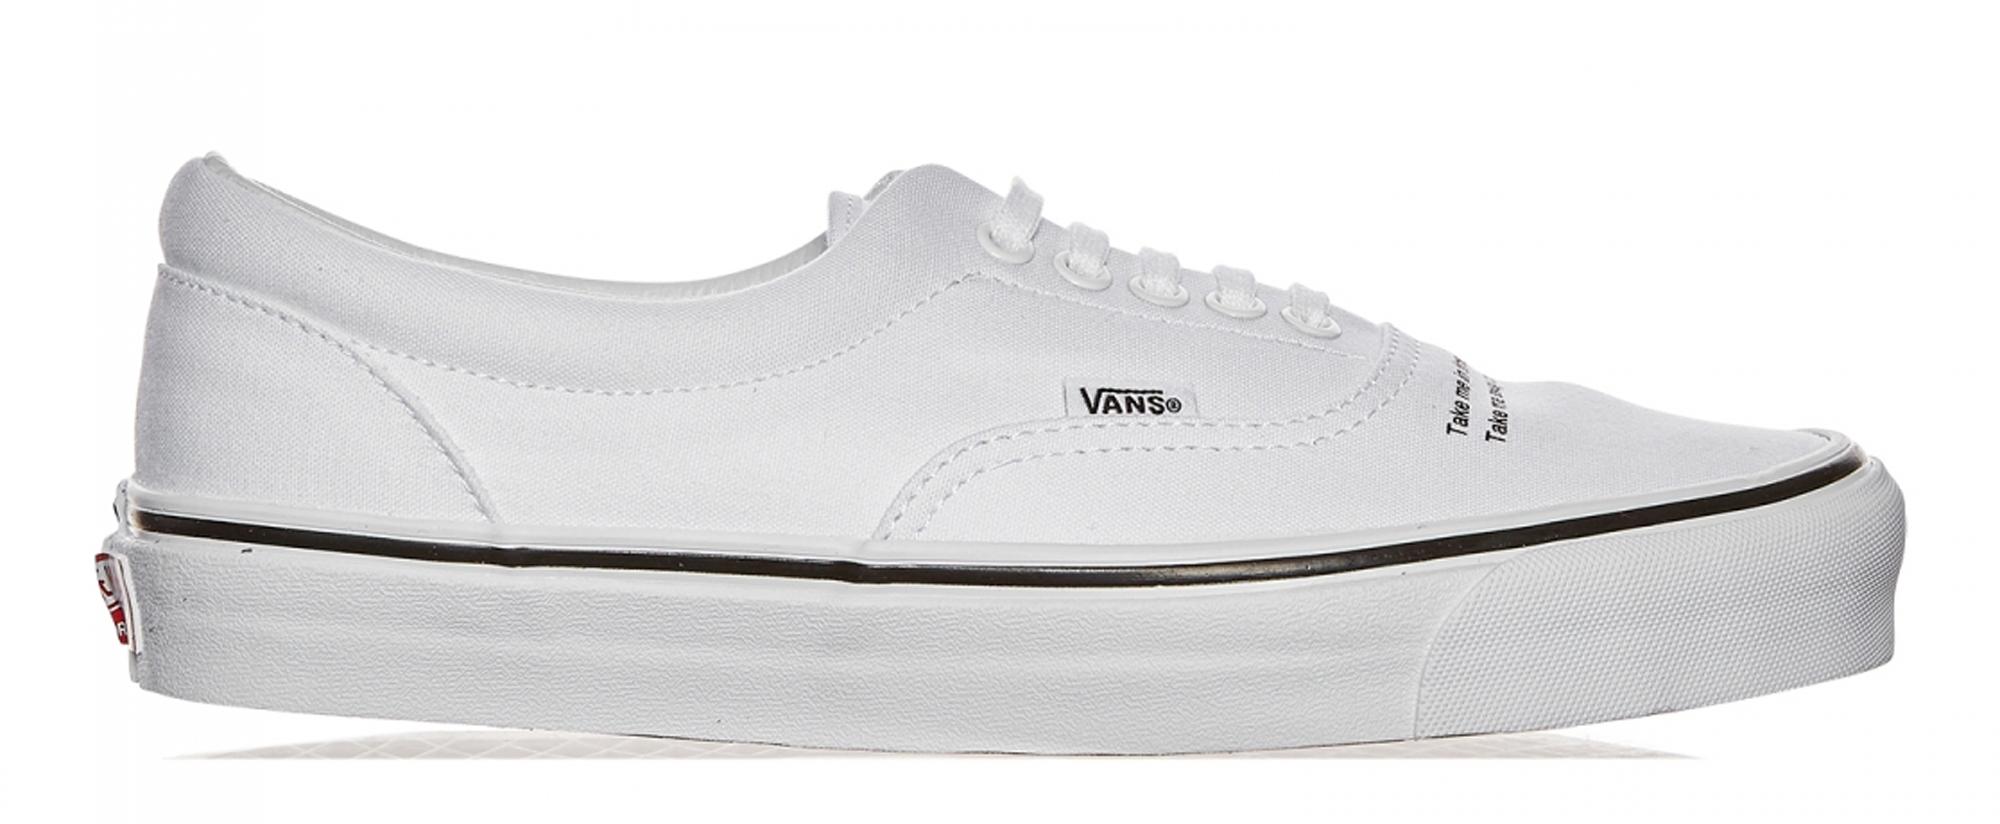 Vans Era Undercover White - VA3CXNNTM